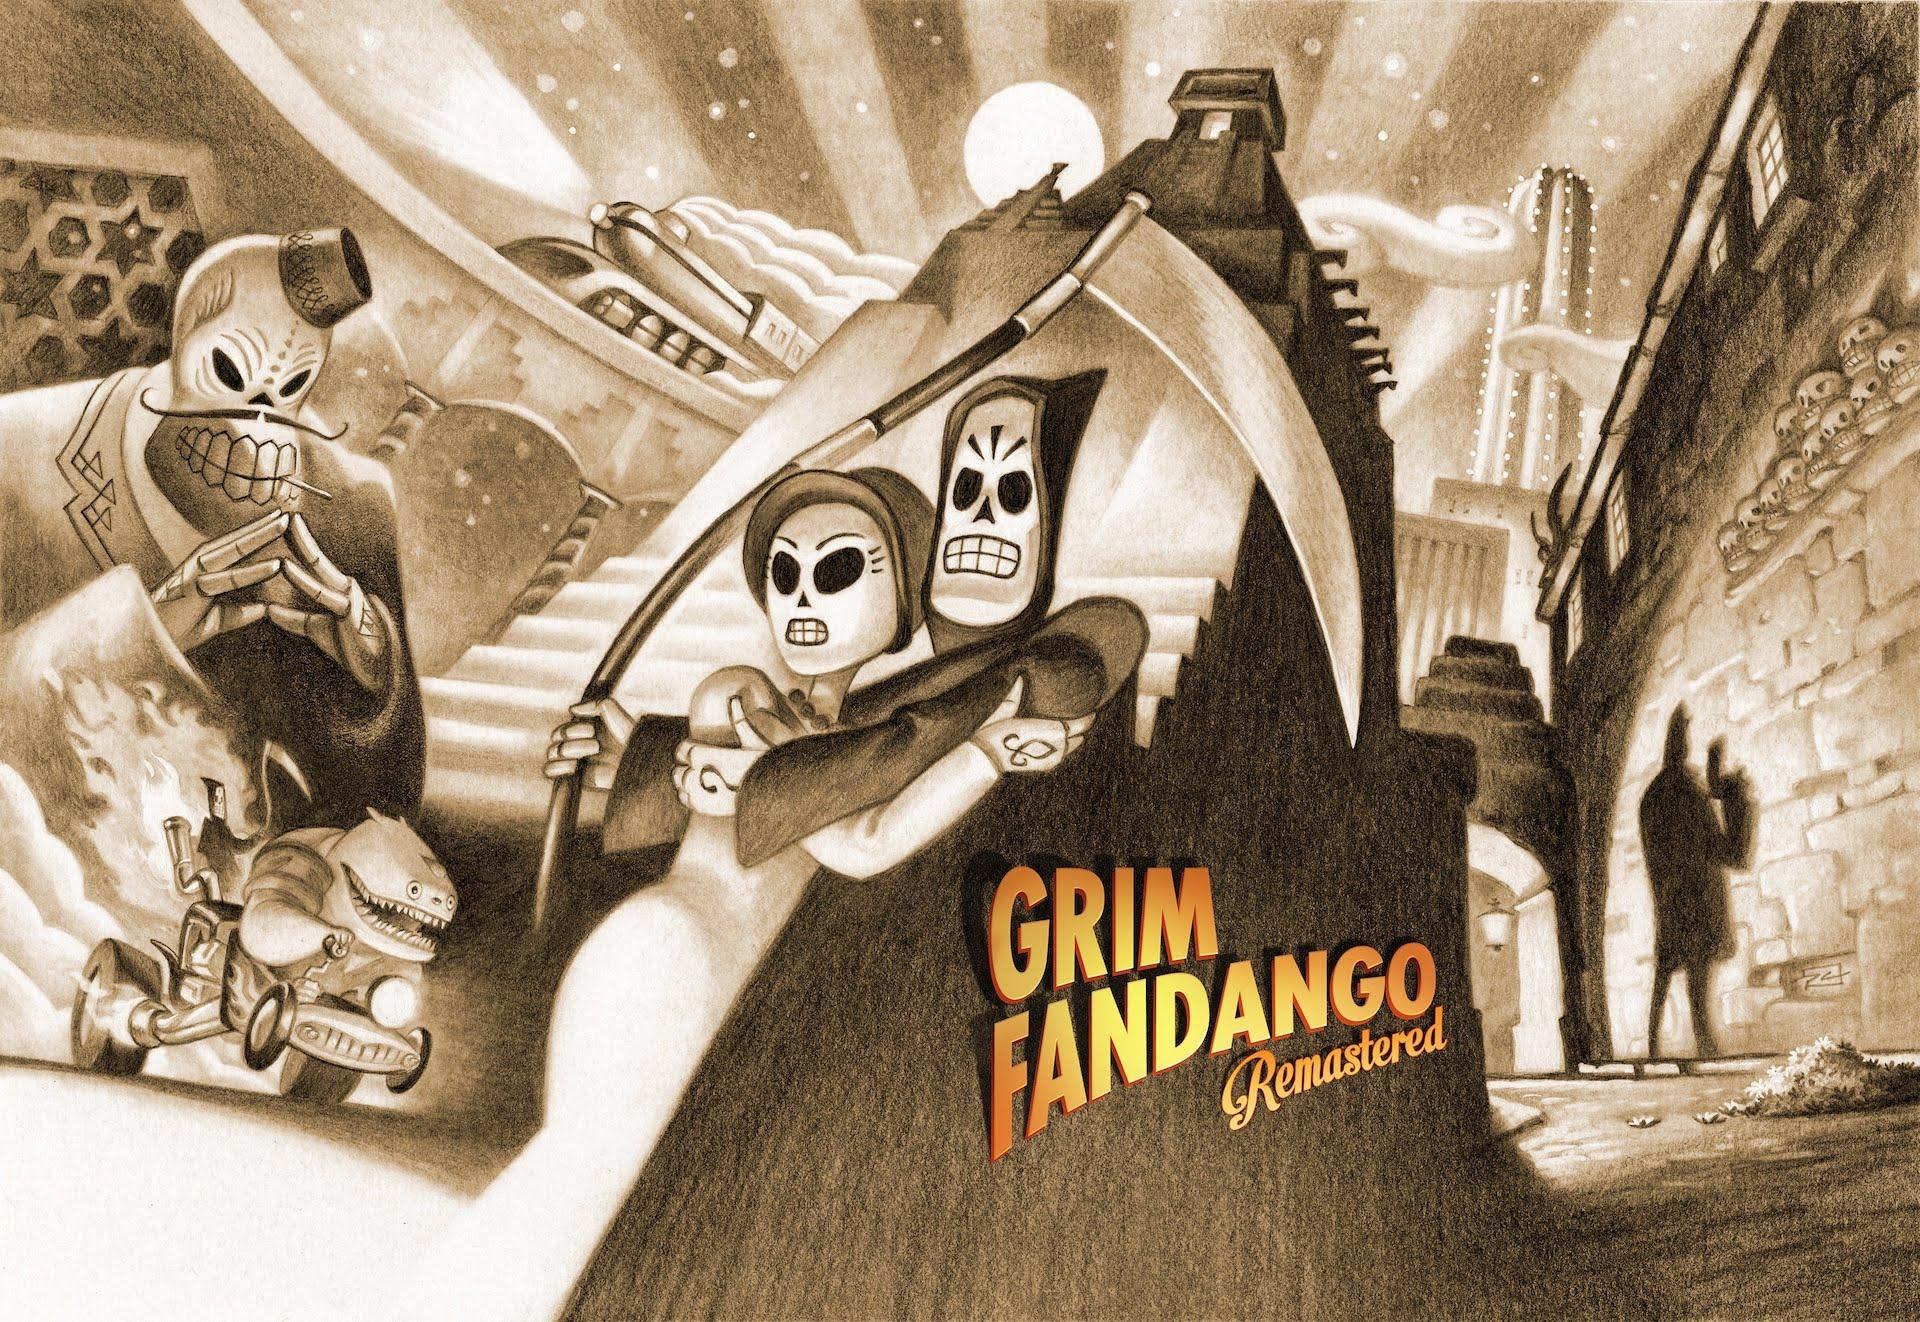 Grim Fandango Remastered is Double Fine's update of a beloved 1998 adventure game.